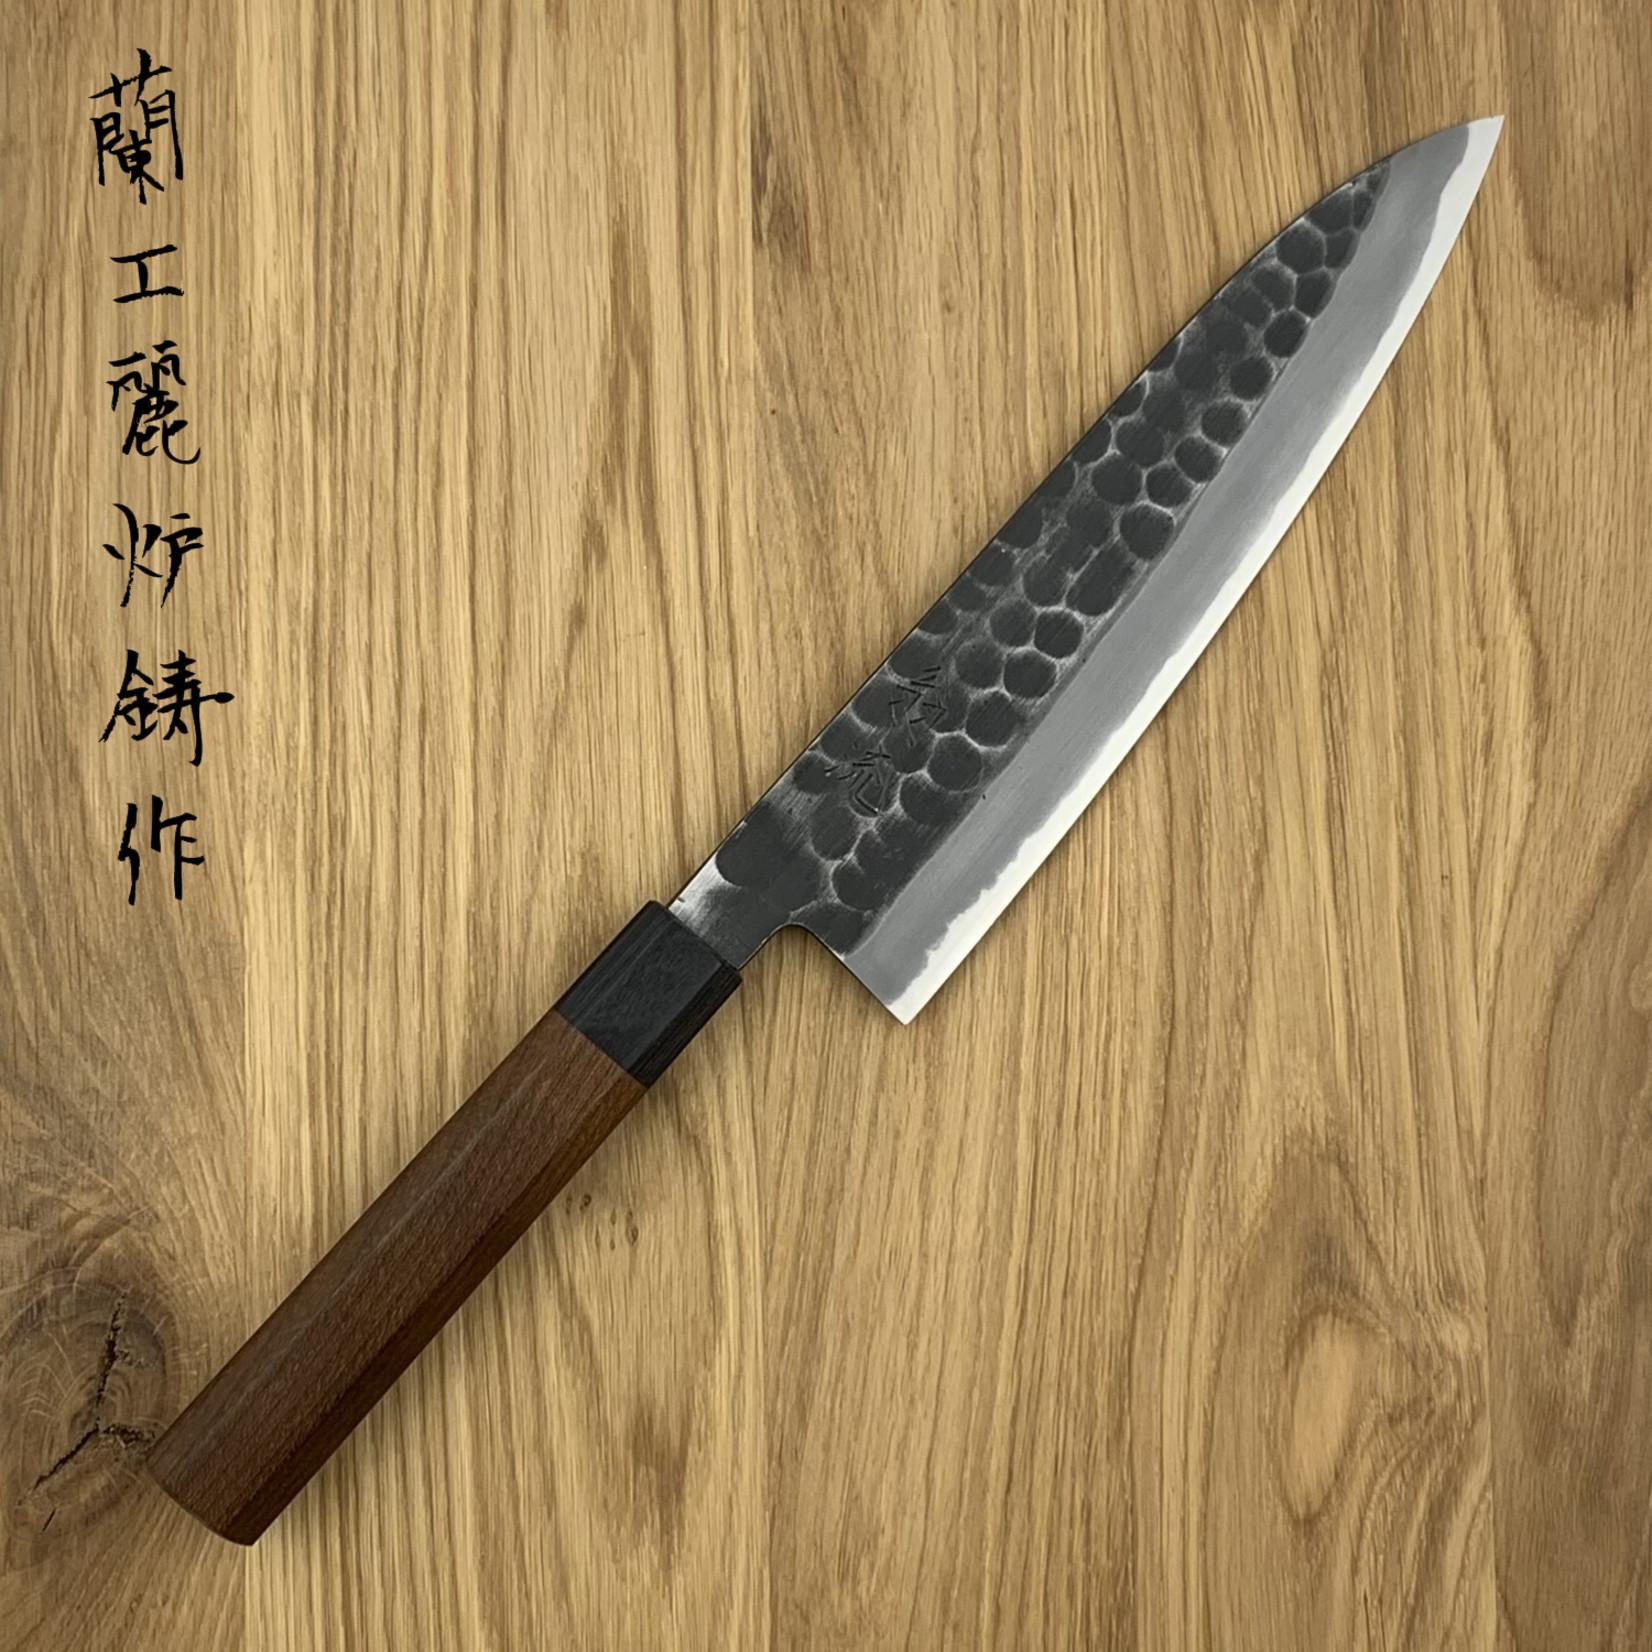 OUL Gyuto 210 mm kurouichi tsuchime white #2 WA maple